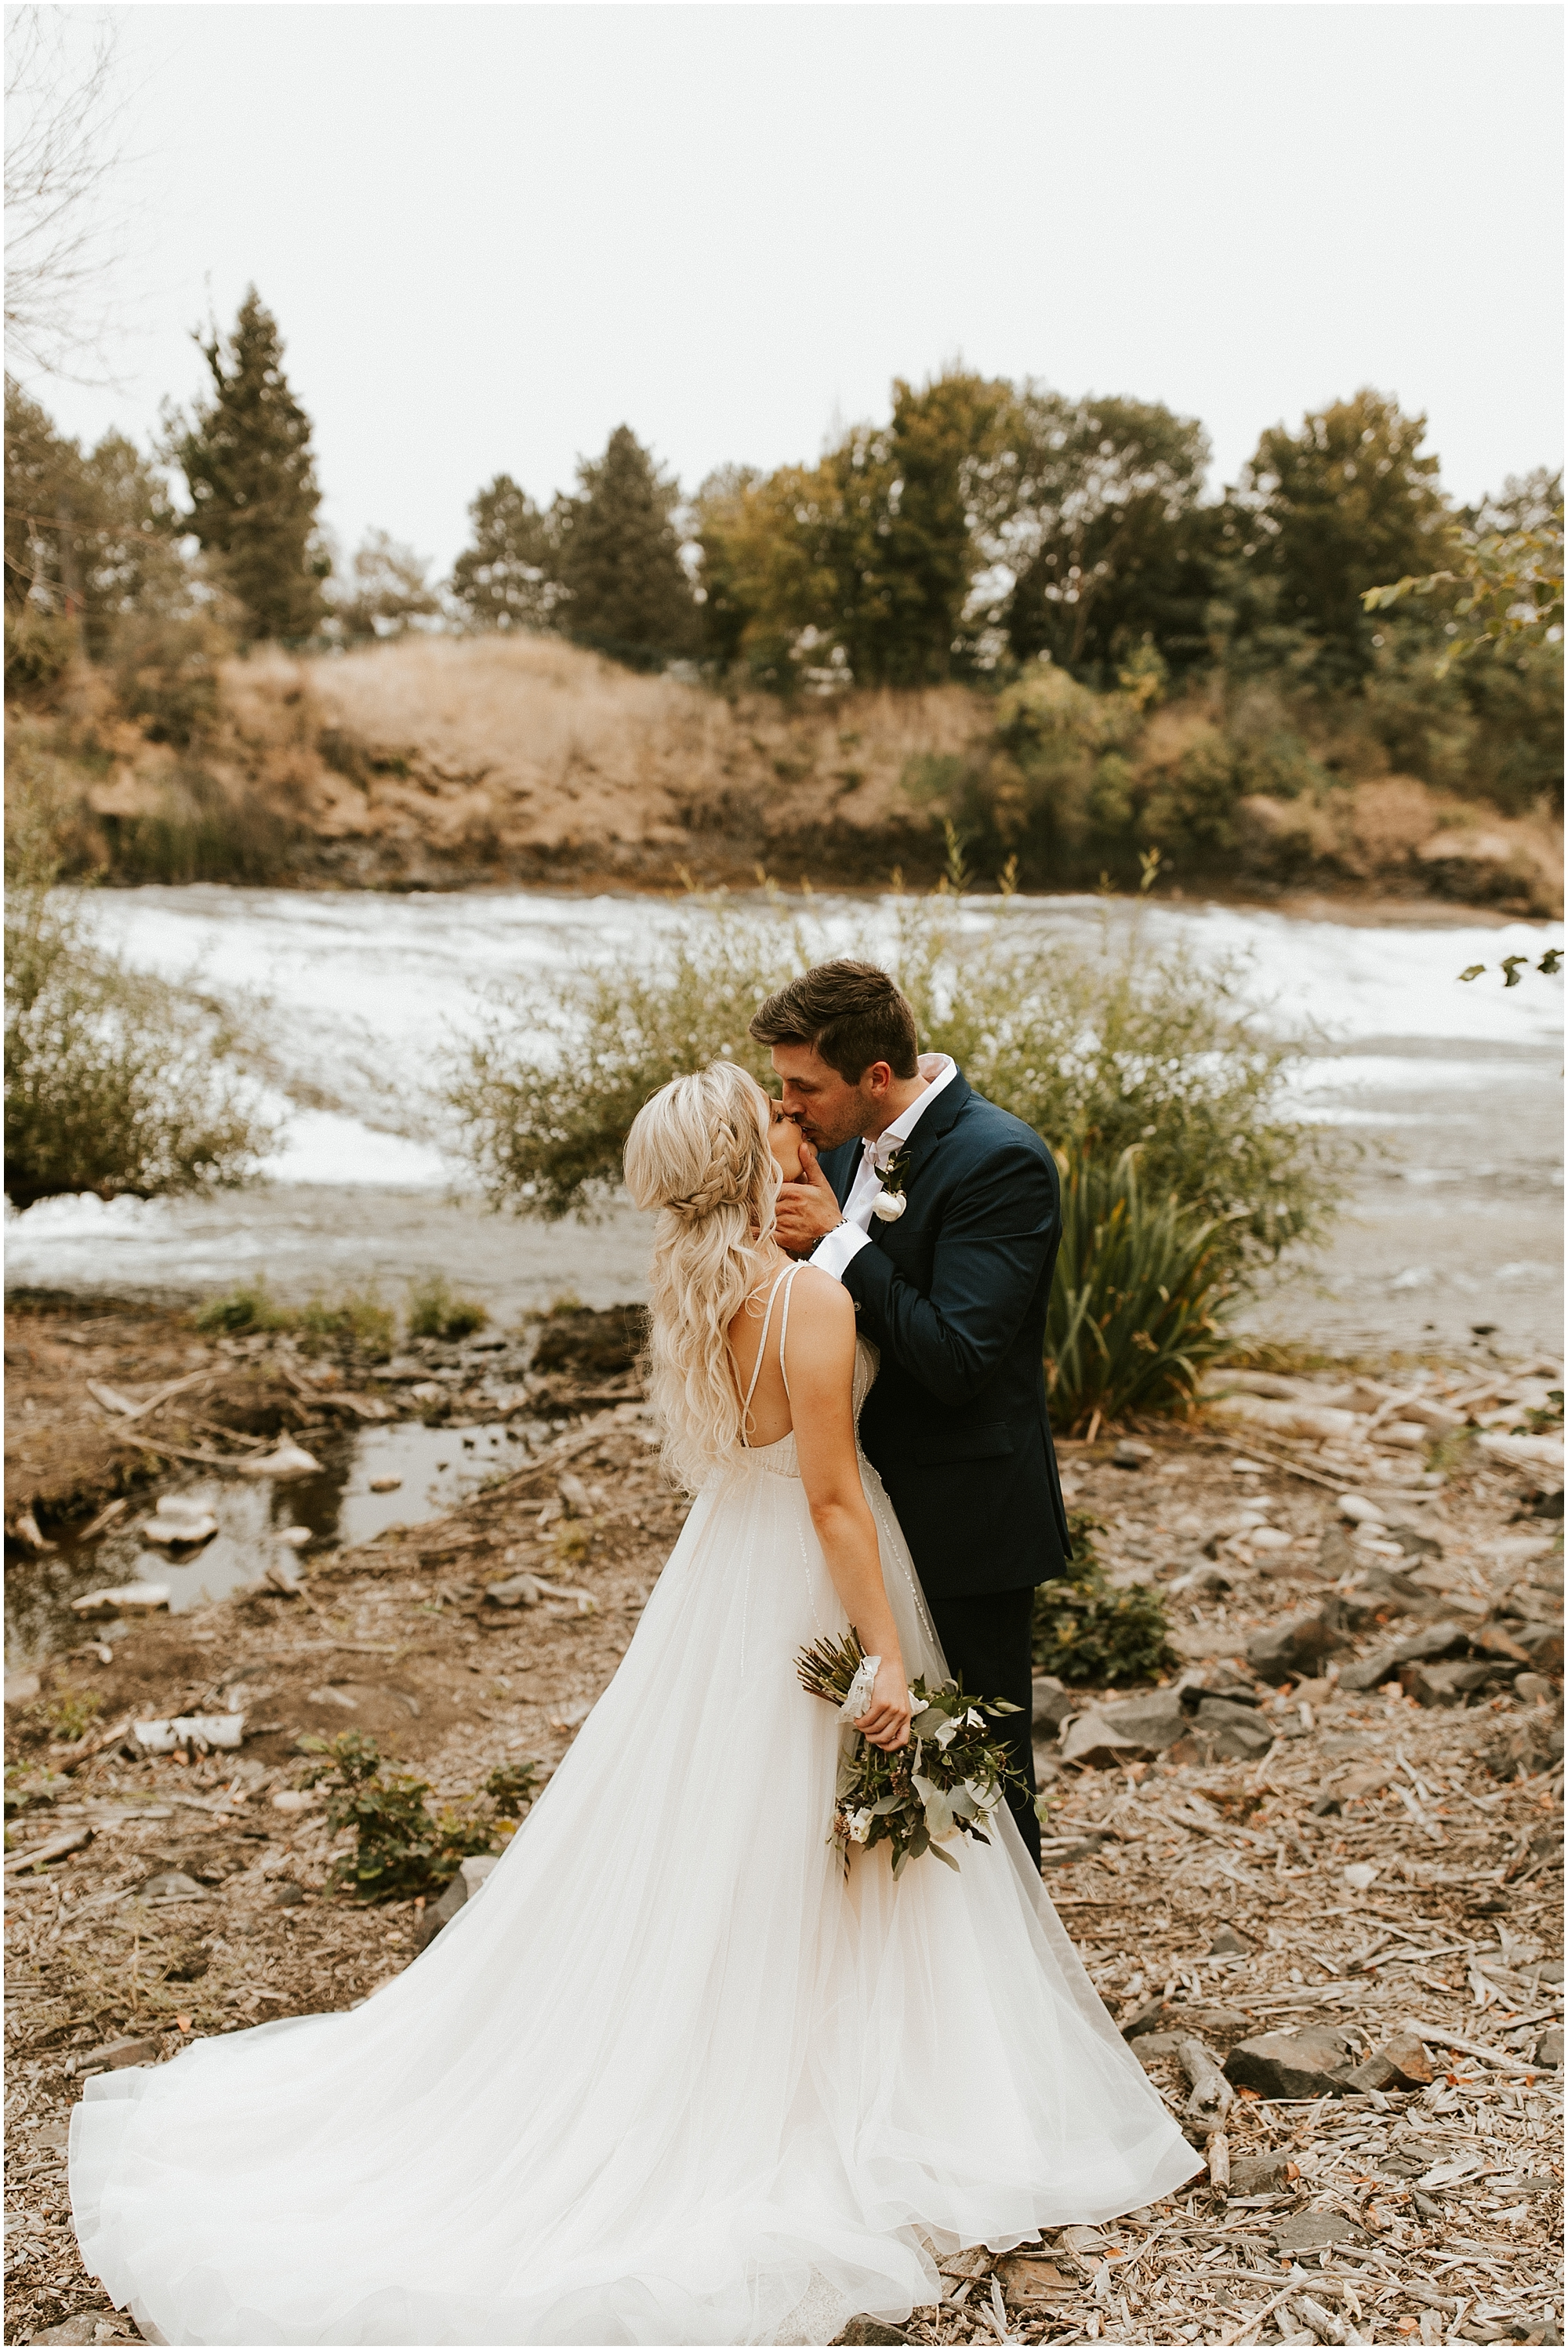 Chateau Rive Spokane Wedding Cassie Trottier Photography1100.jpg